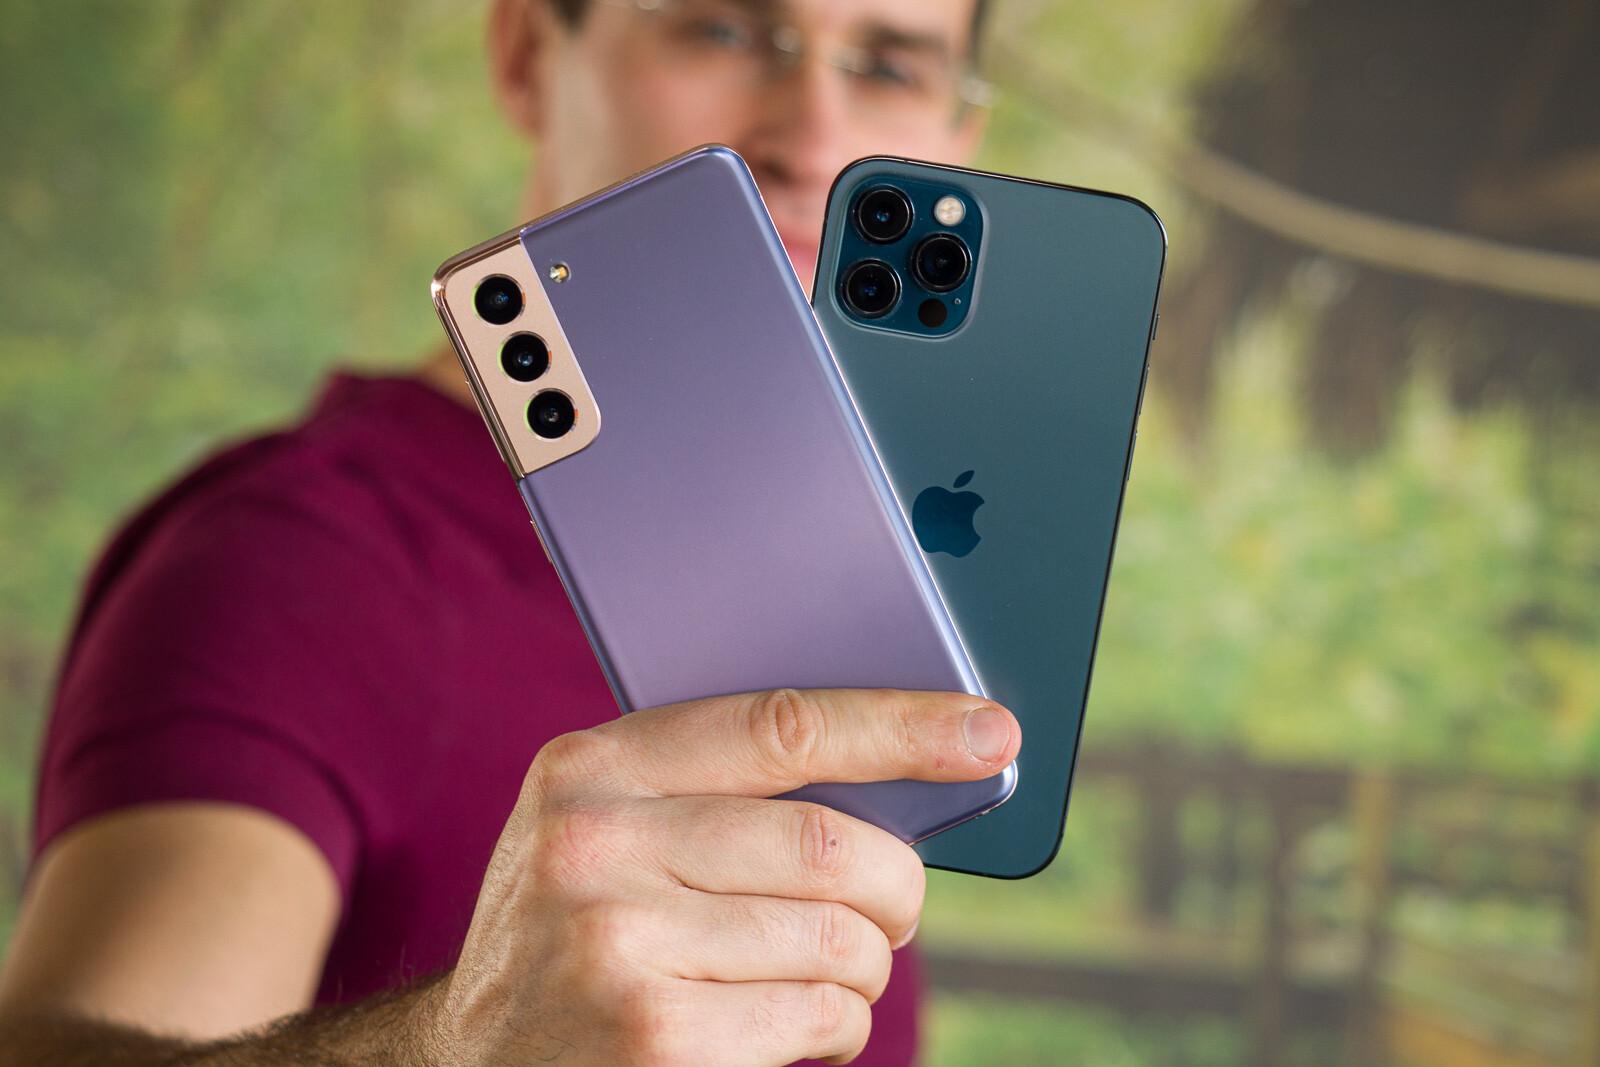 Samsung Galaxy S21 vs Apple iPhone 12 Pro